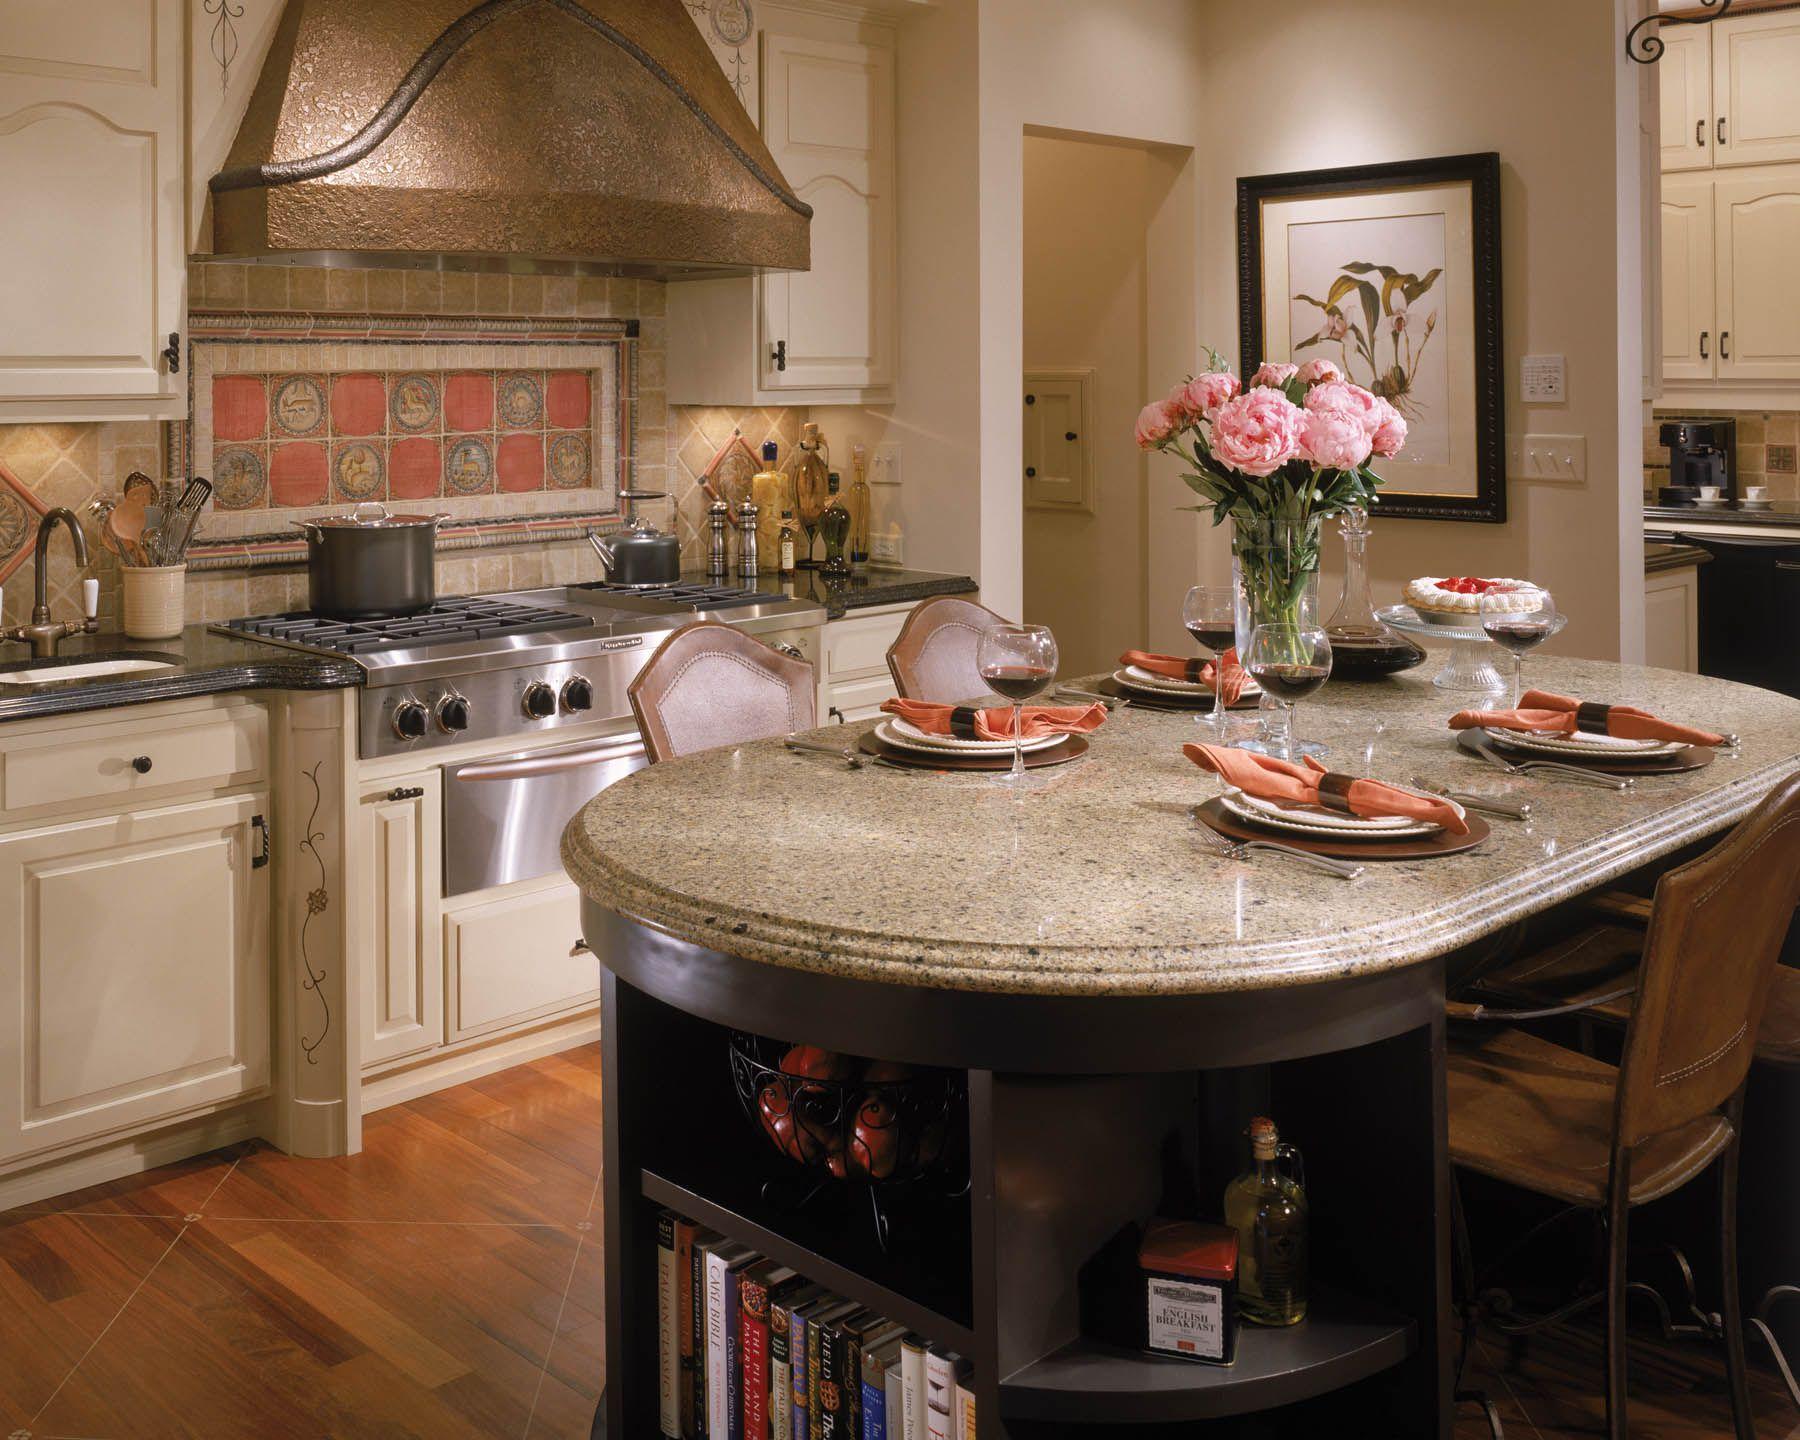 Kitchen Island Used As Dining Table kitchen island countertop ideas | round kitchen island | pinterest